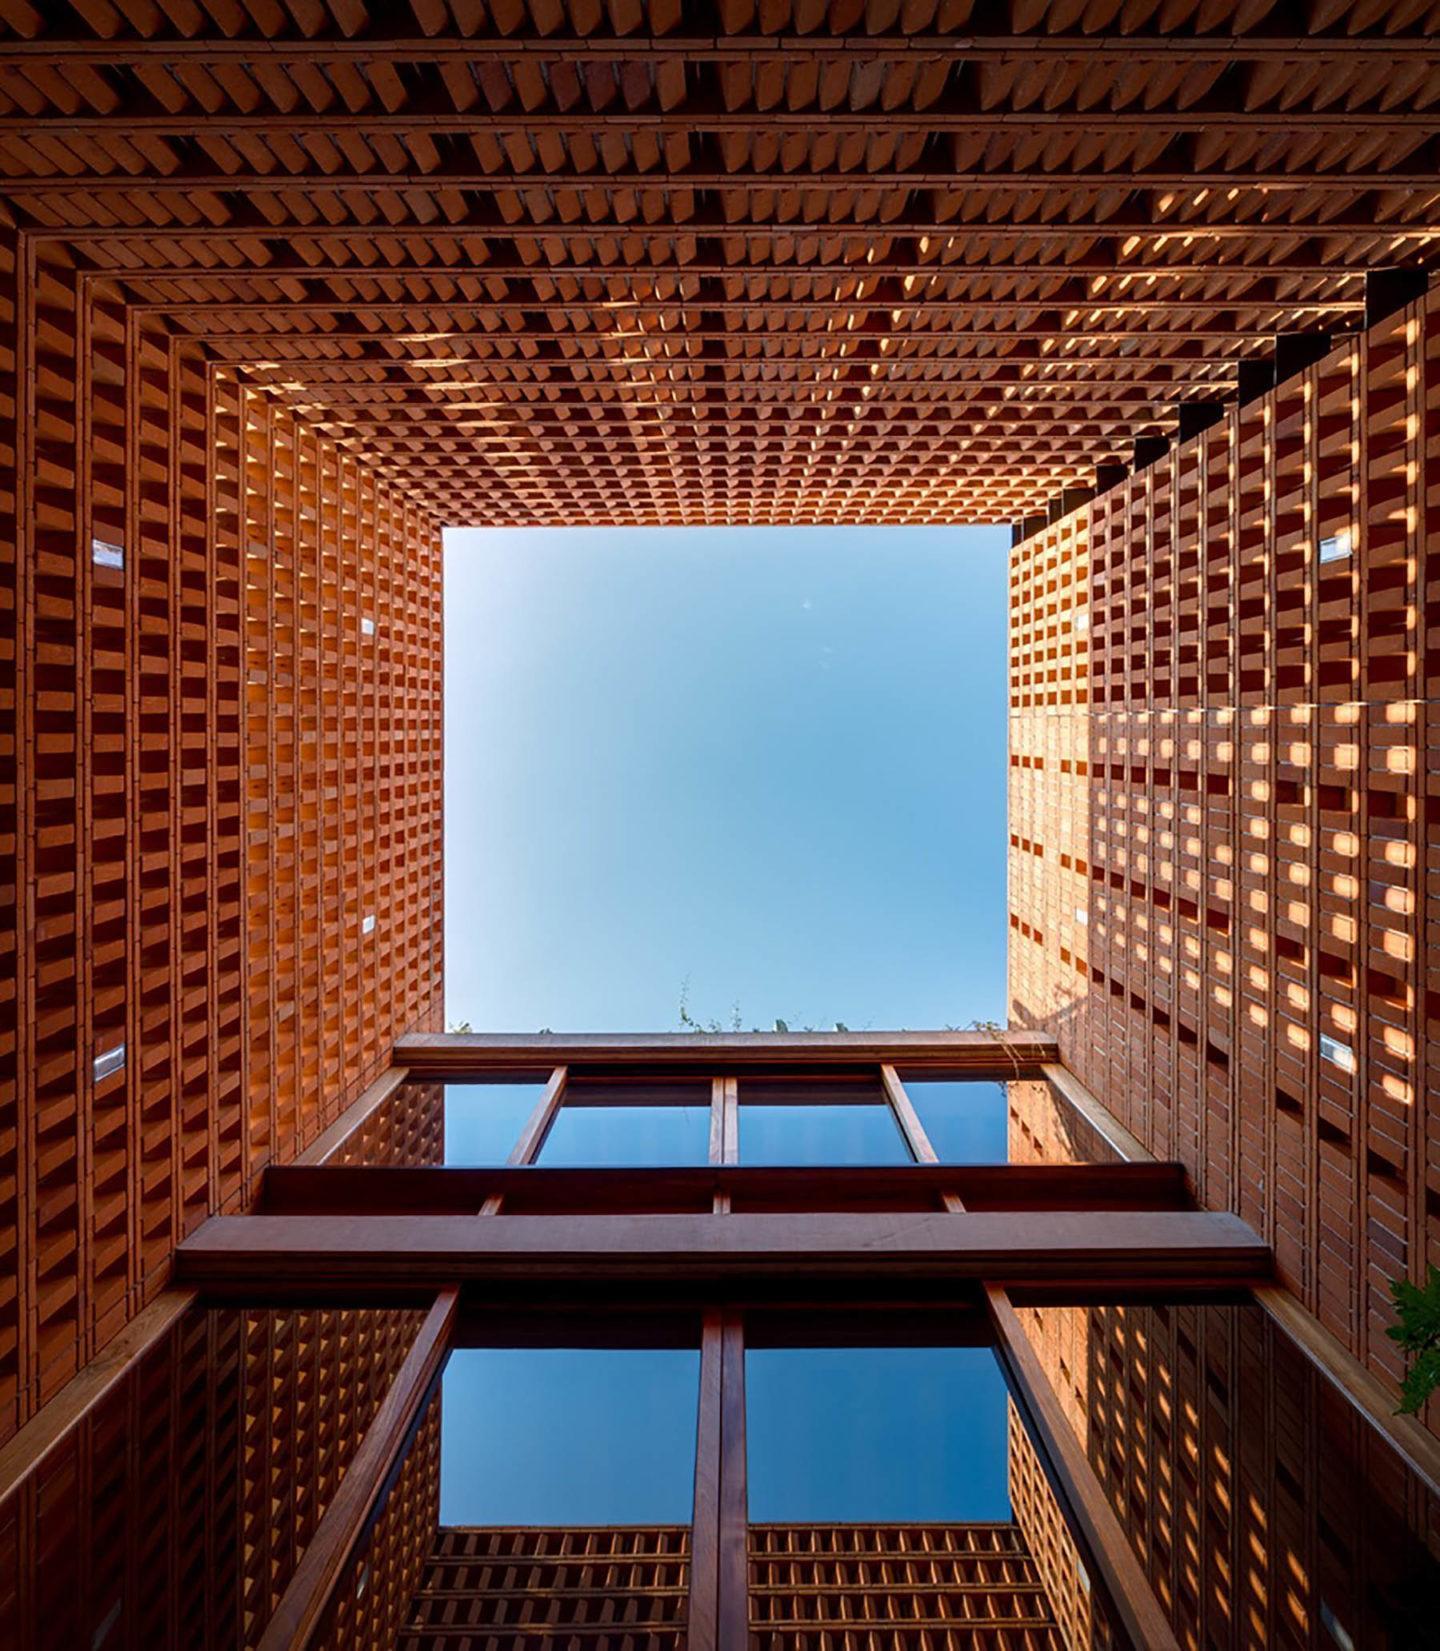 IGNANT-Architecture-Taller-De-Arquitectura-Mauricio-Rocha-Gabriela-Carrillo-Iturbide-Studio-24